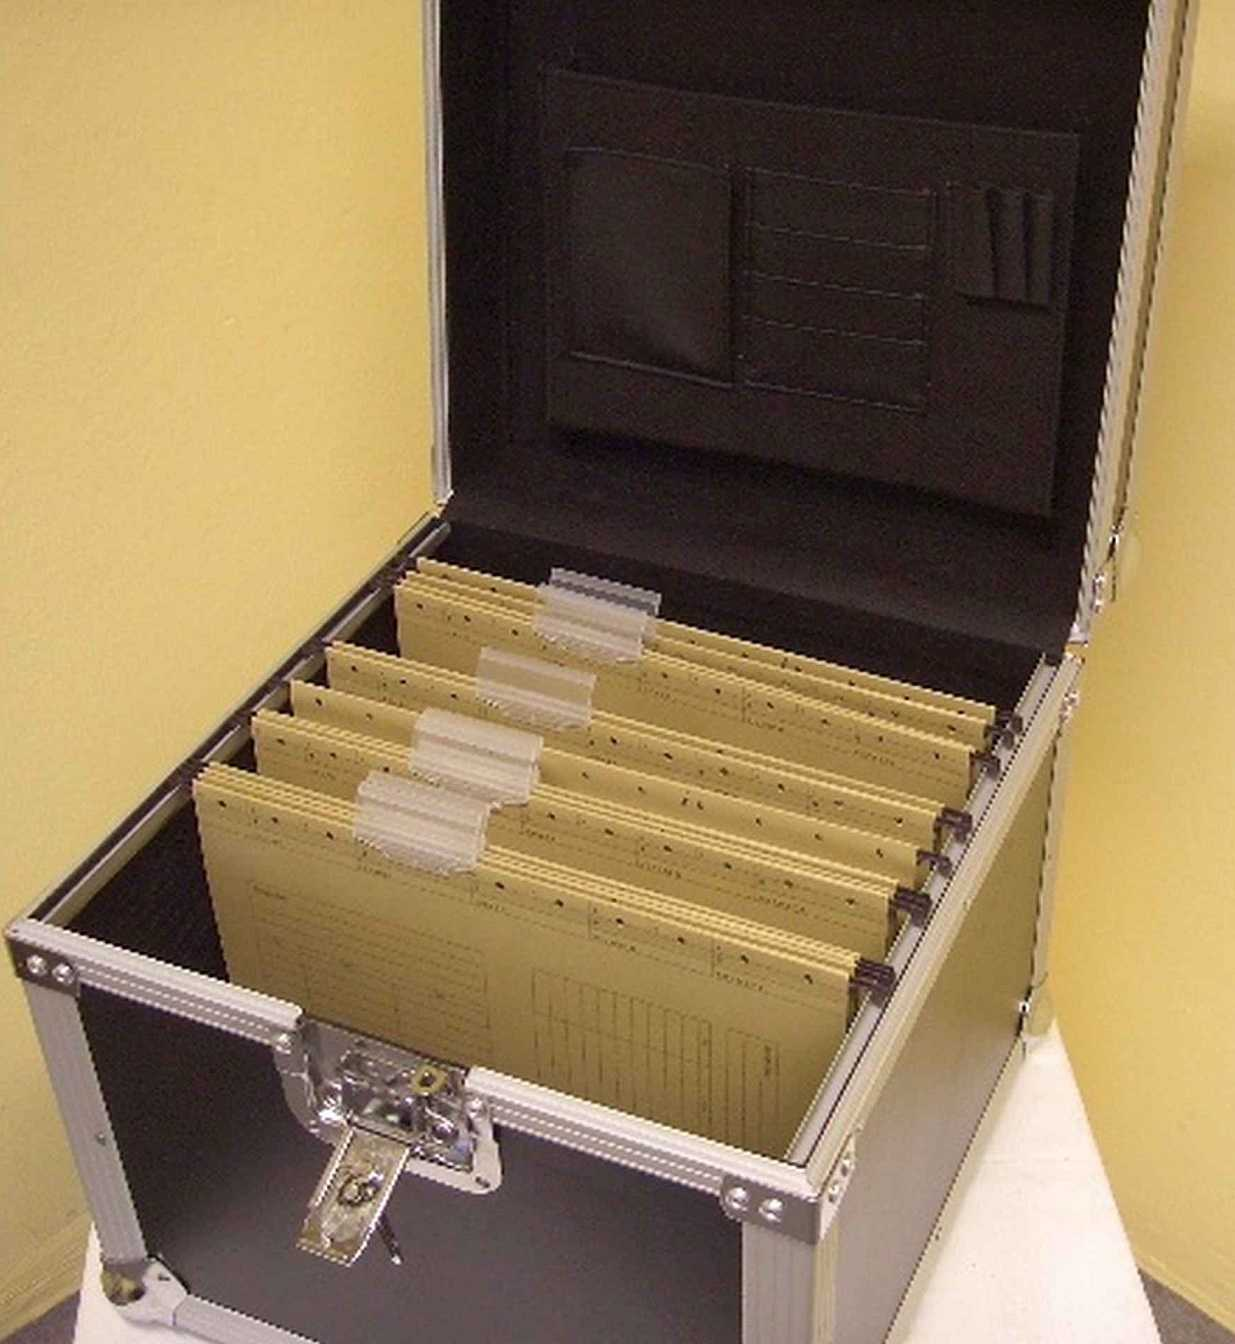 dokumentencase aktencase registraturen case dokumentenkoffer dokumenten koffer ebay. Black Bedroom Furniture Sets. Home Design Ideas